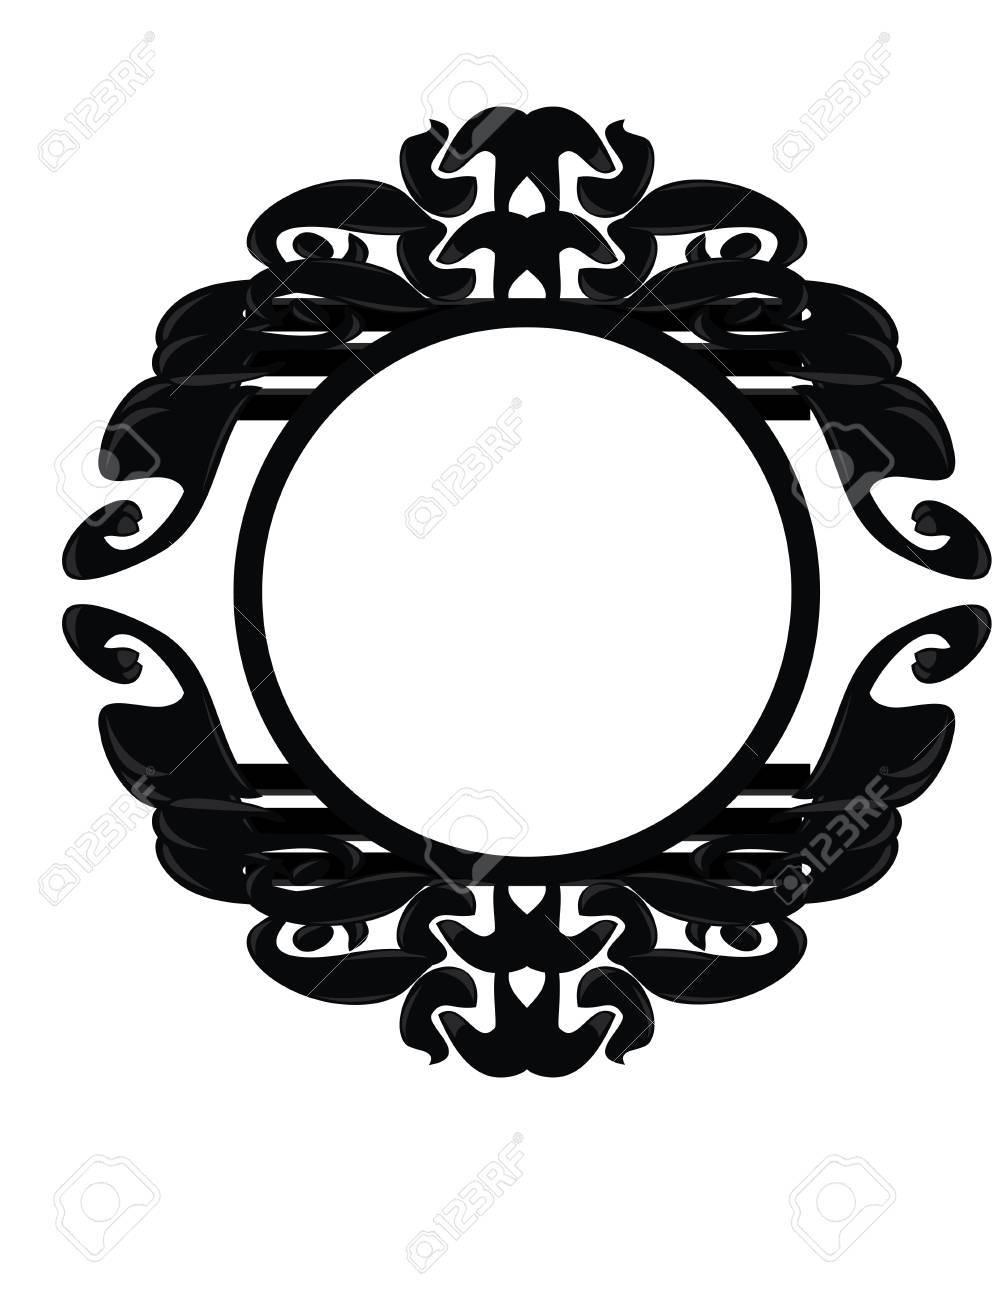 Black, gray, and white frame design element Stock Vector - 7315102